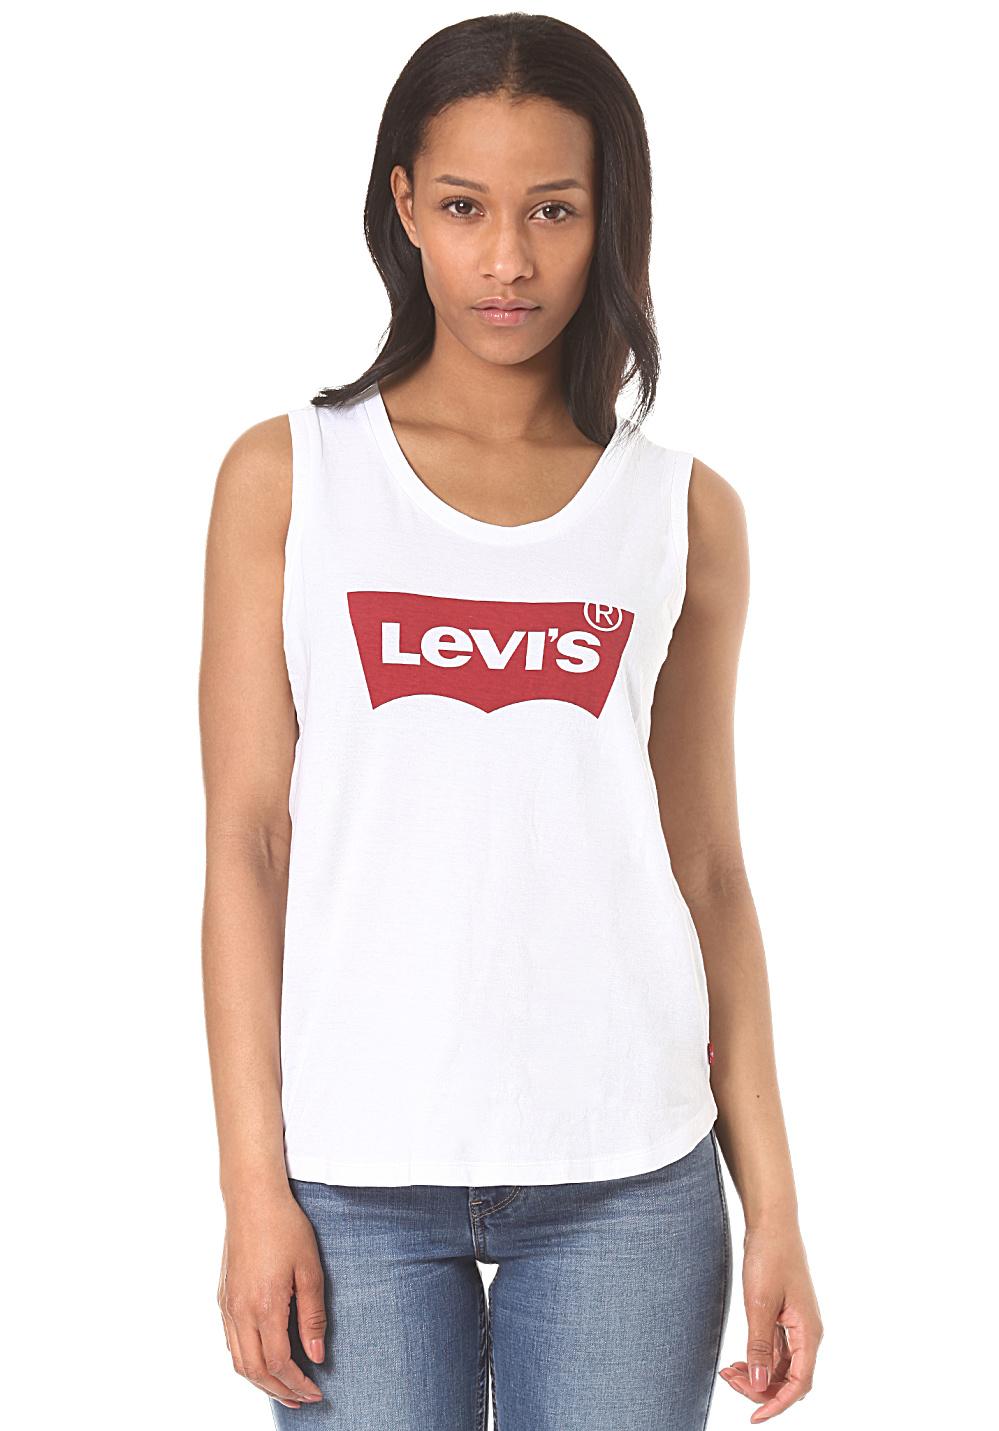 levis-the-muscle-top-femmes-blancs